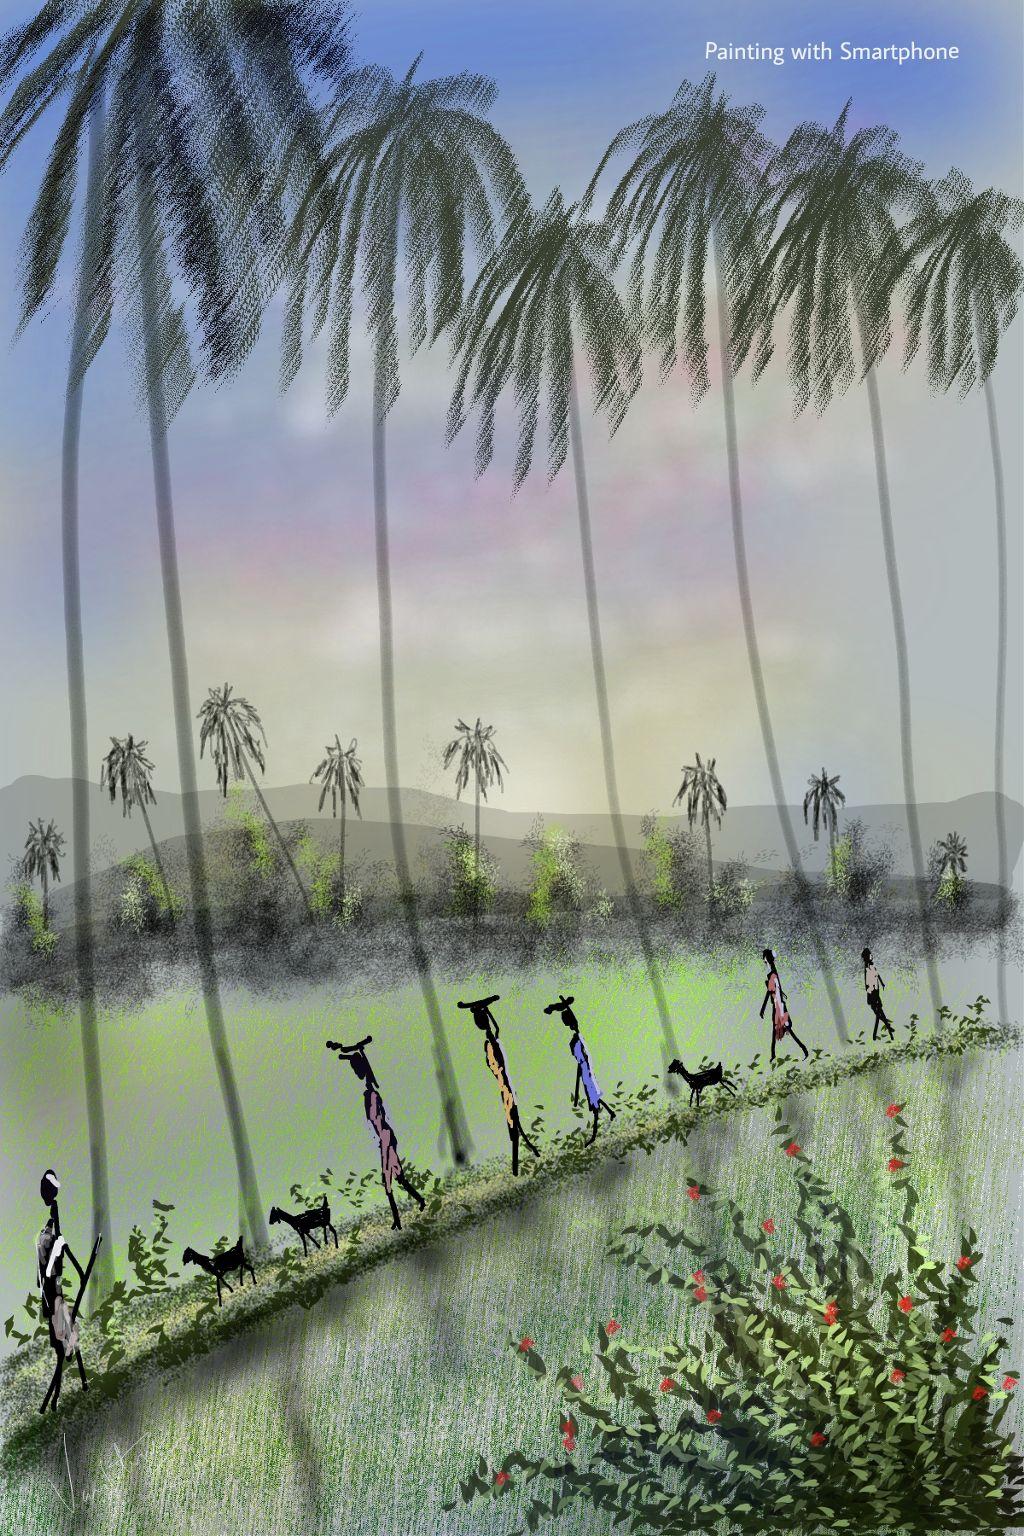 #drawing #share #nature #enjoy #life